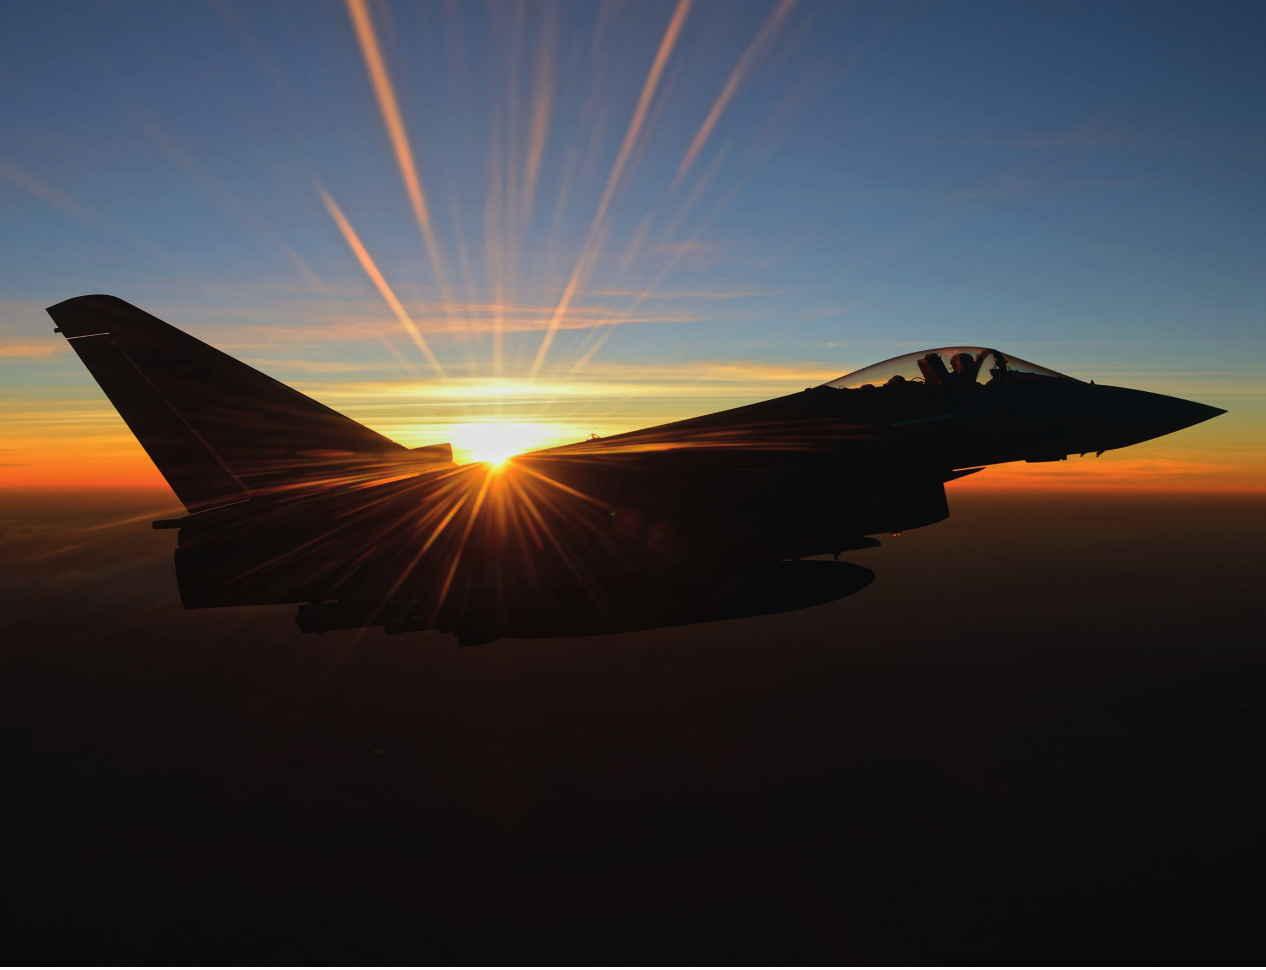 L'Arabie Saoudite souhaite acquérir 48 Eurofighter